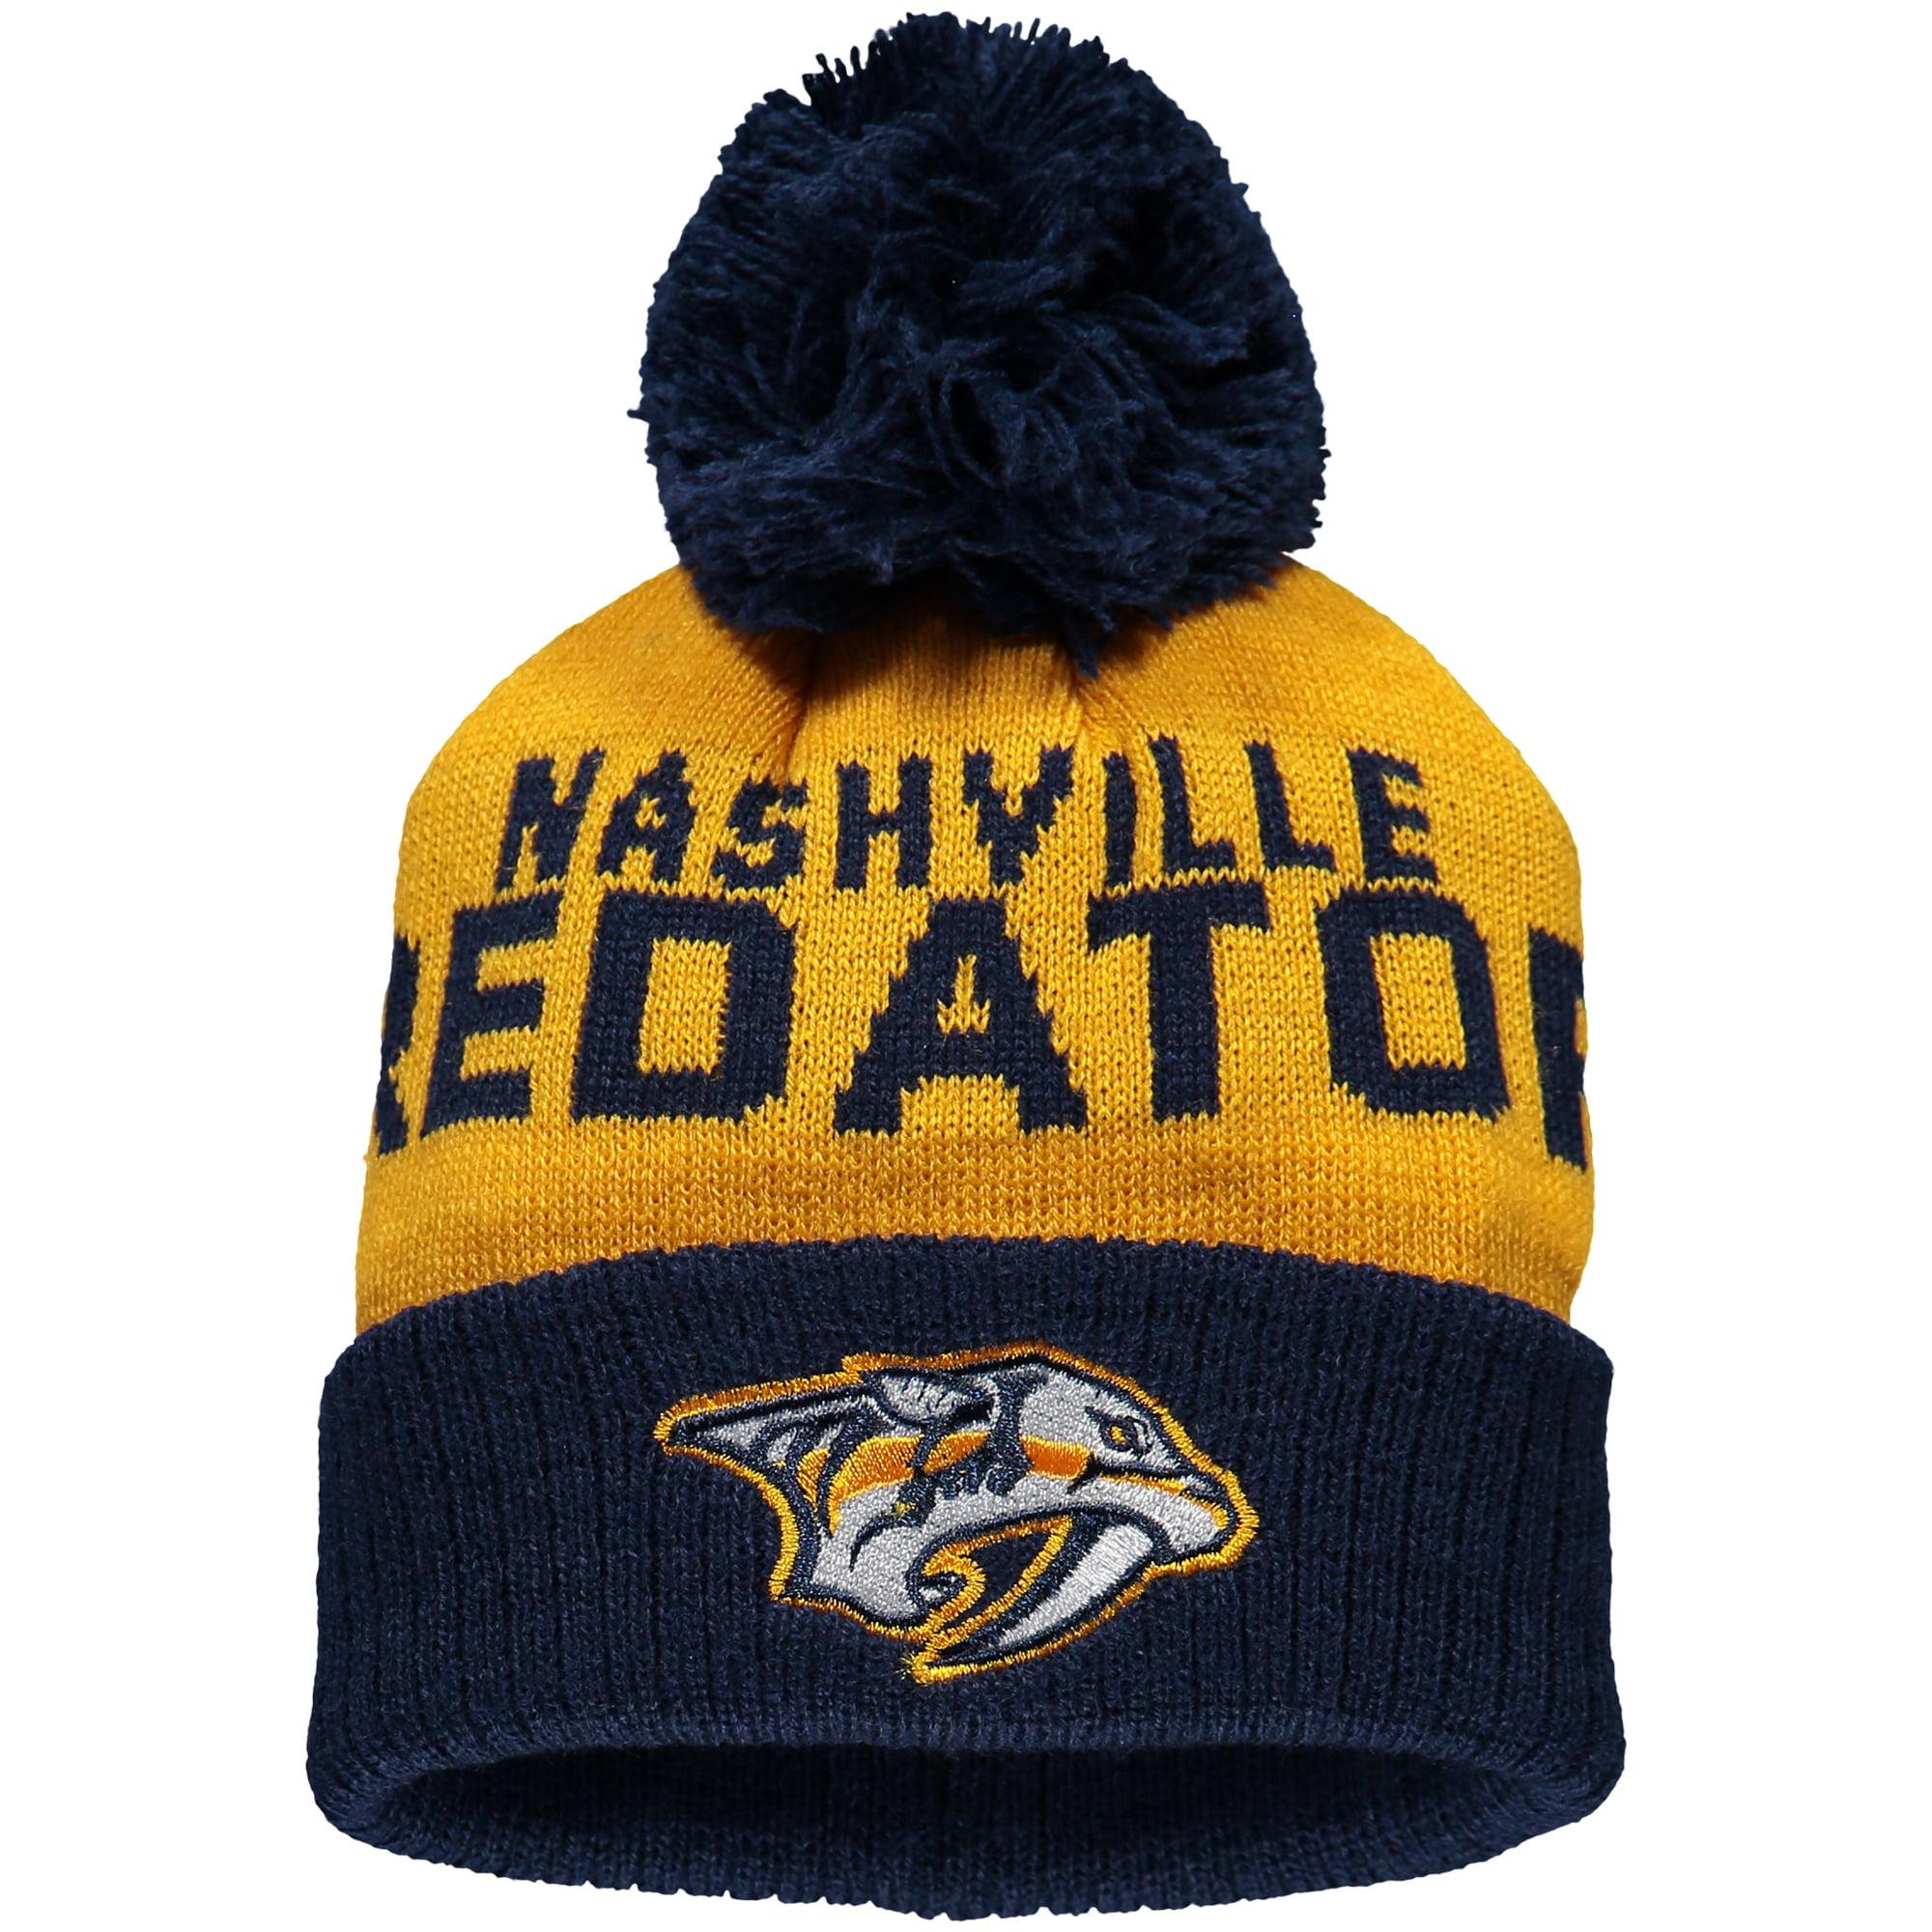 Nashville Predators Newborn & Infant Block Wordmark Cuffed Knit Hat with Pom - Gold/Navy - OSFA